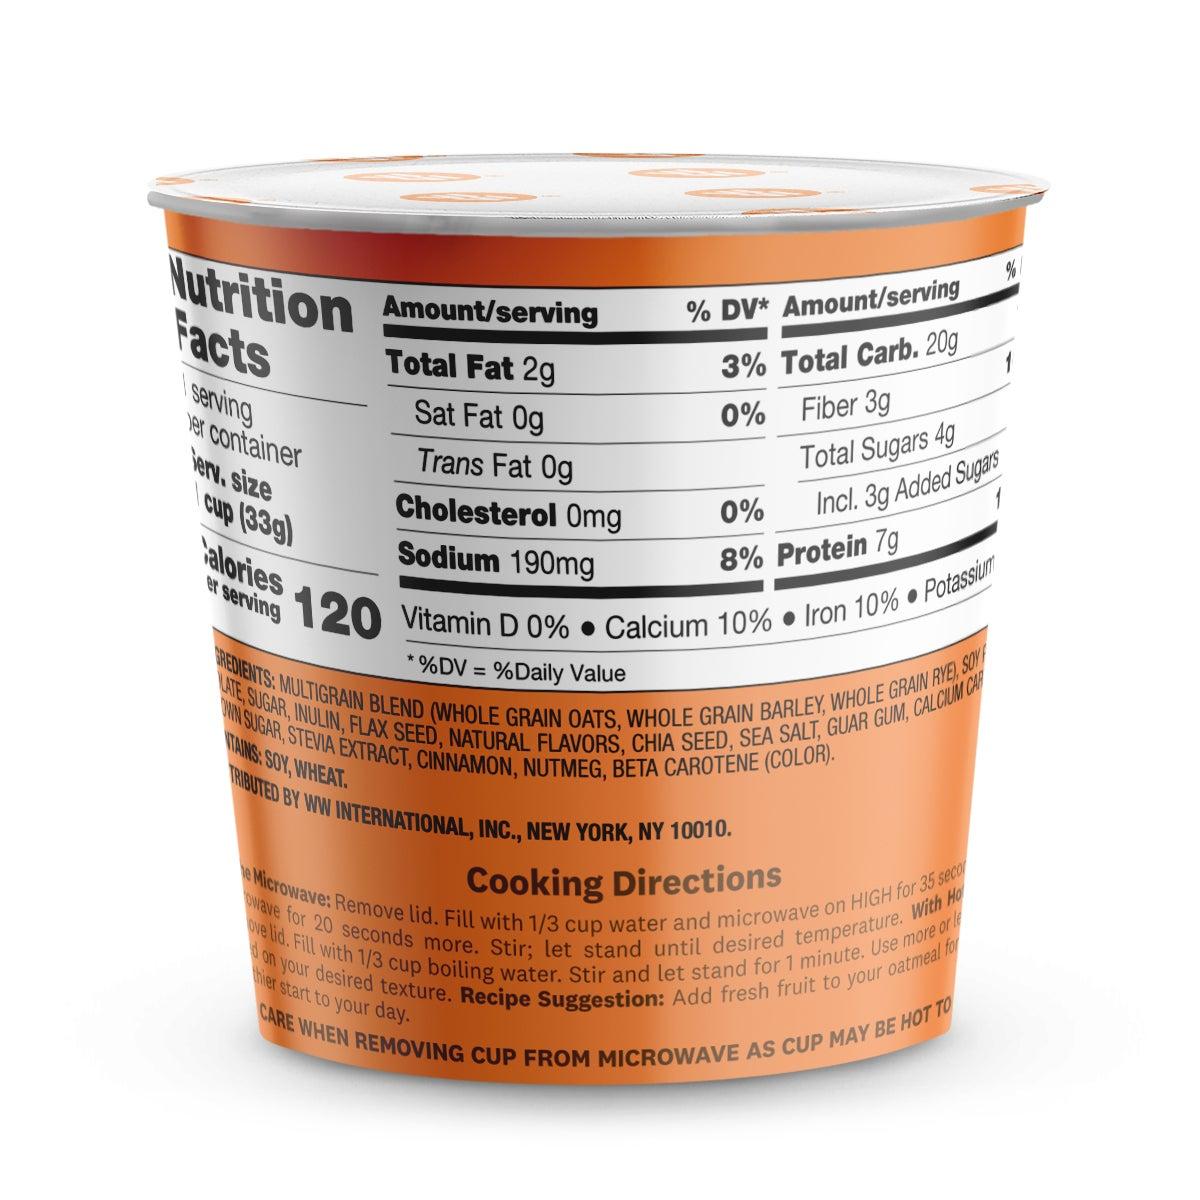 Pumpkin Spice Oatmeal - back of box 2